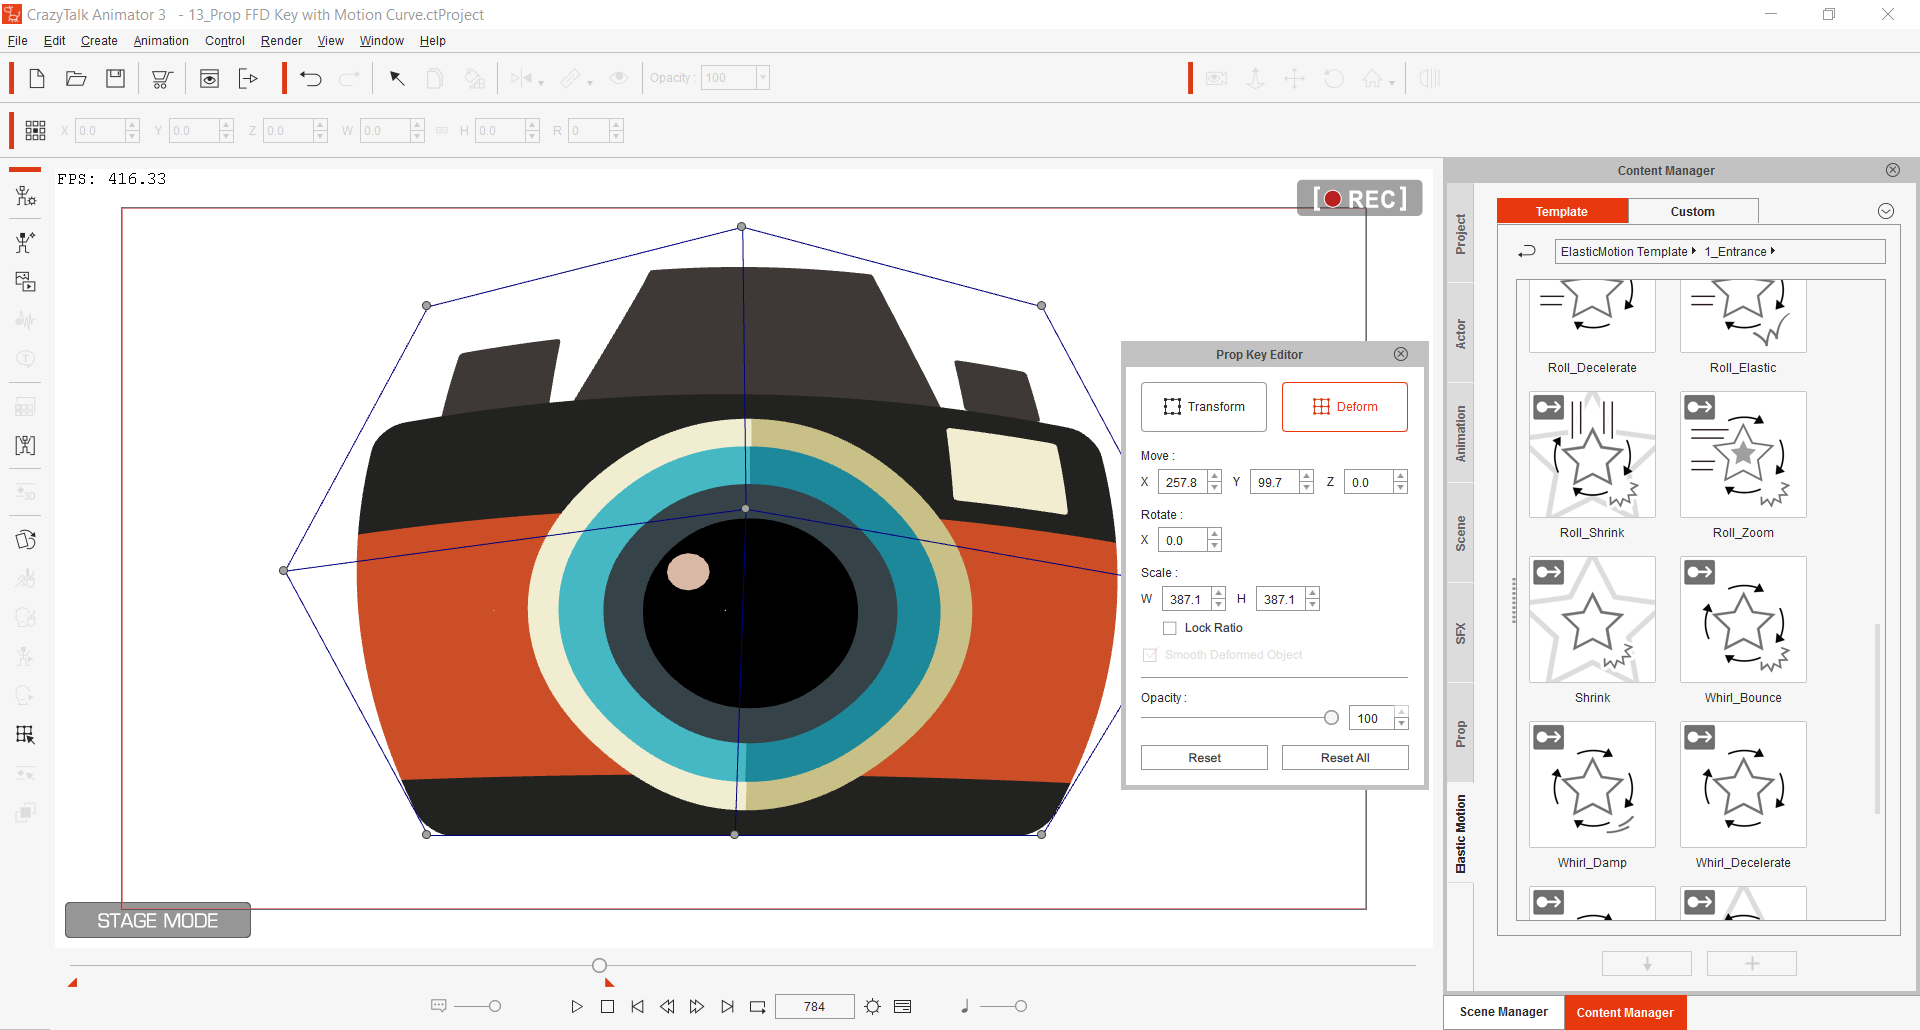 crazytalk-animator-4996_7_4996.png